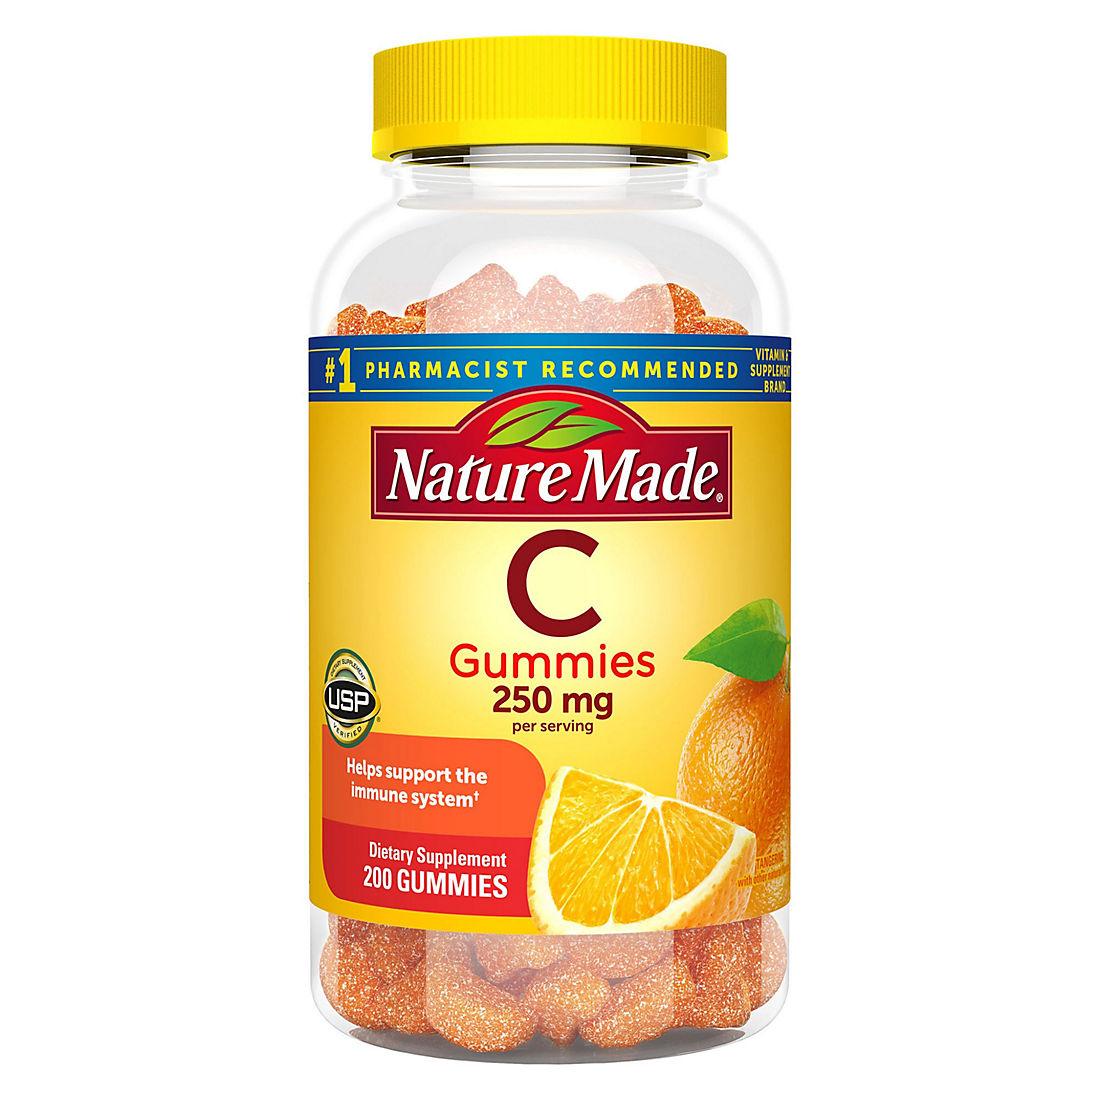 photograph regarding Ester C Coupons Printable named Mother nature Produced Vitamin C Grownup Gummies, 200 ct.